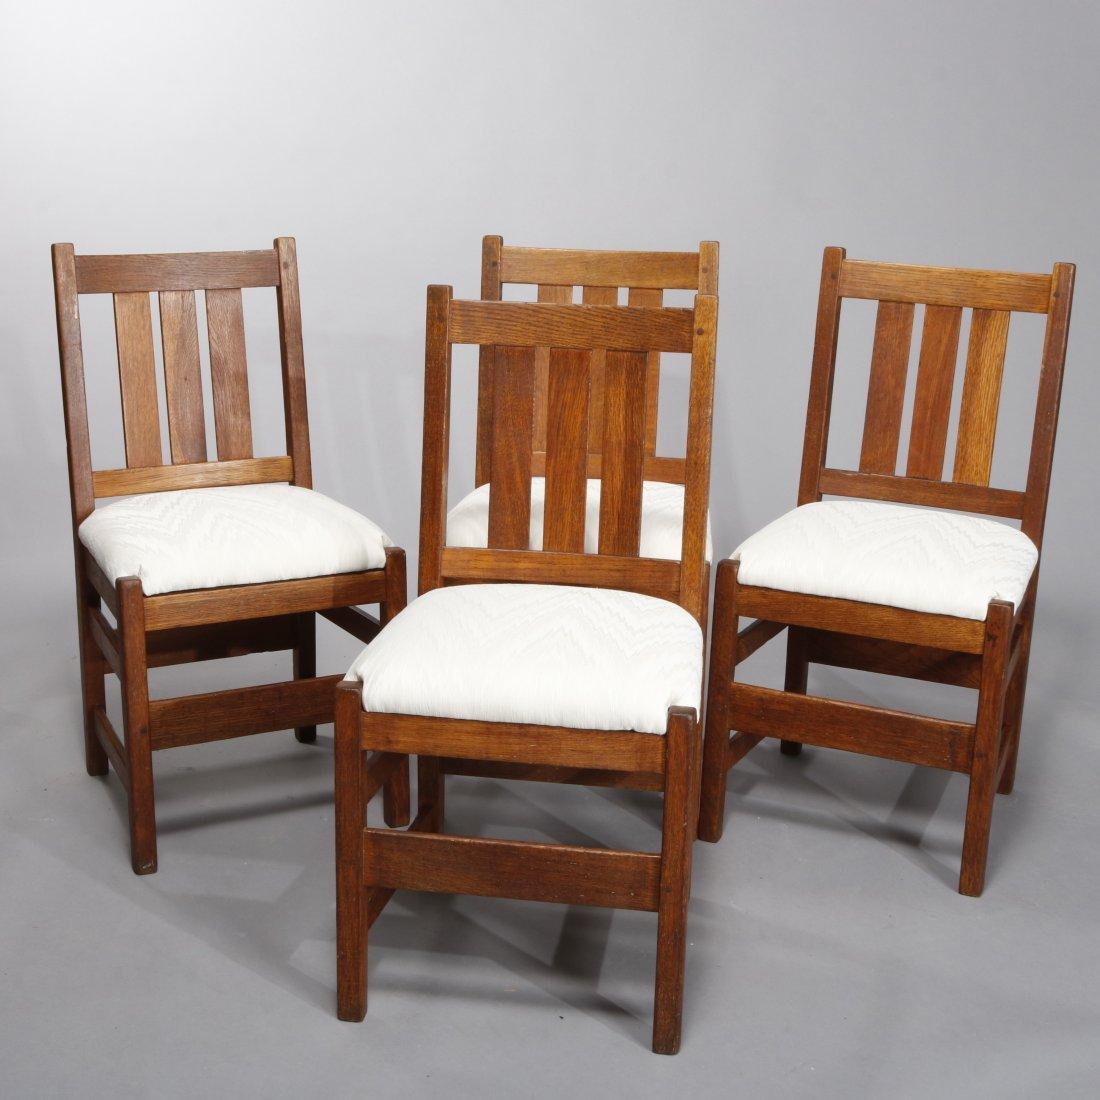 Antique Arts & Crafts L& JG Stickley Mission Oak Chairs